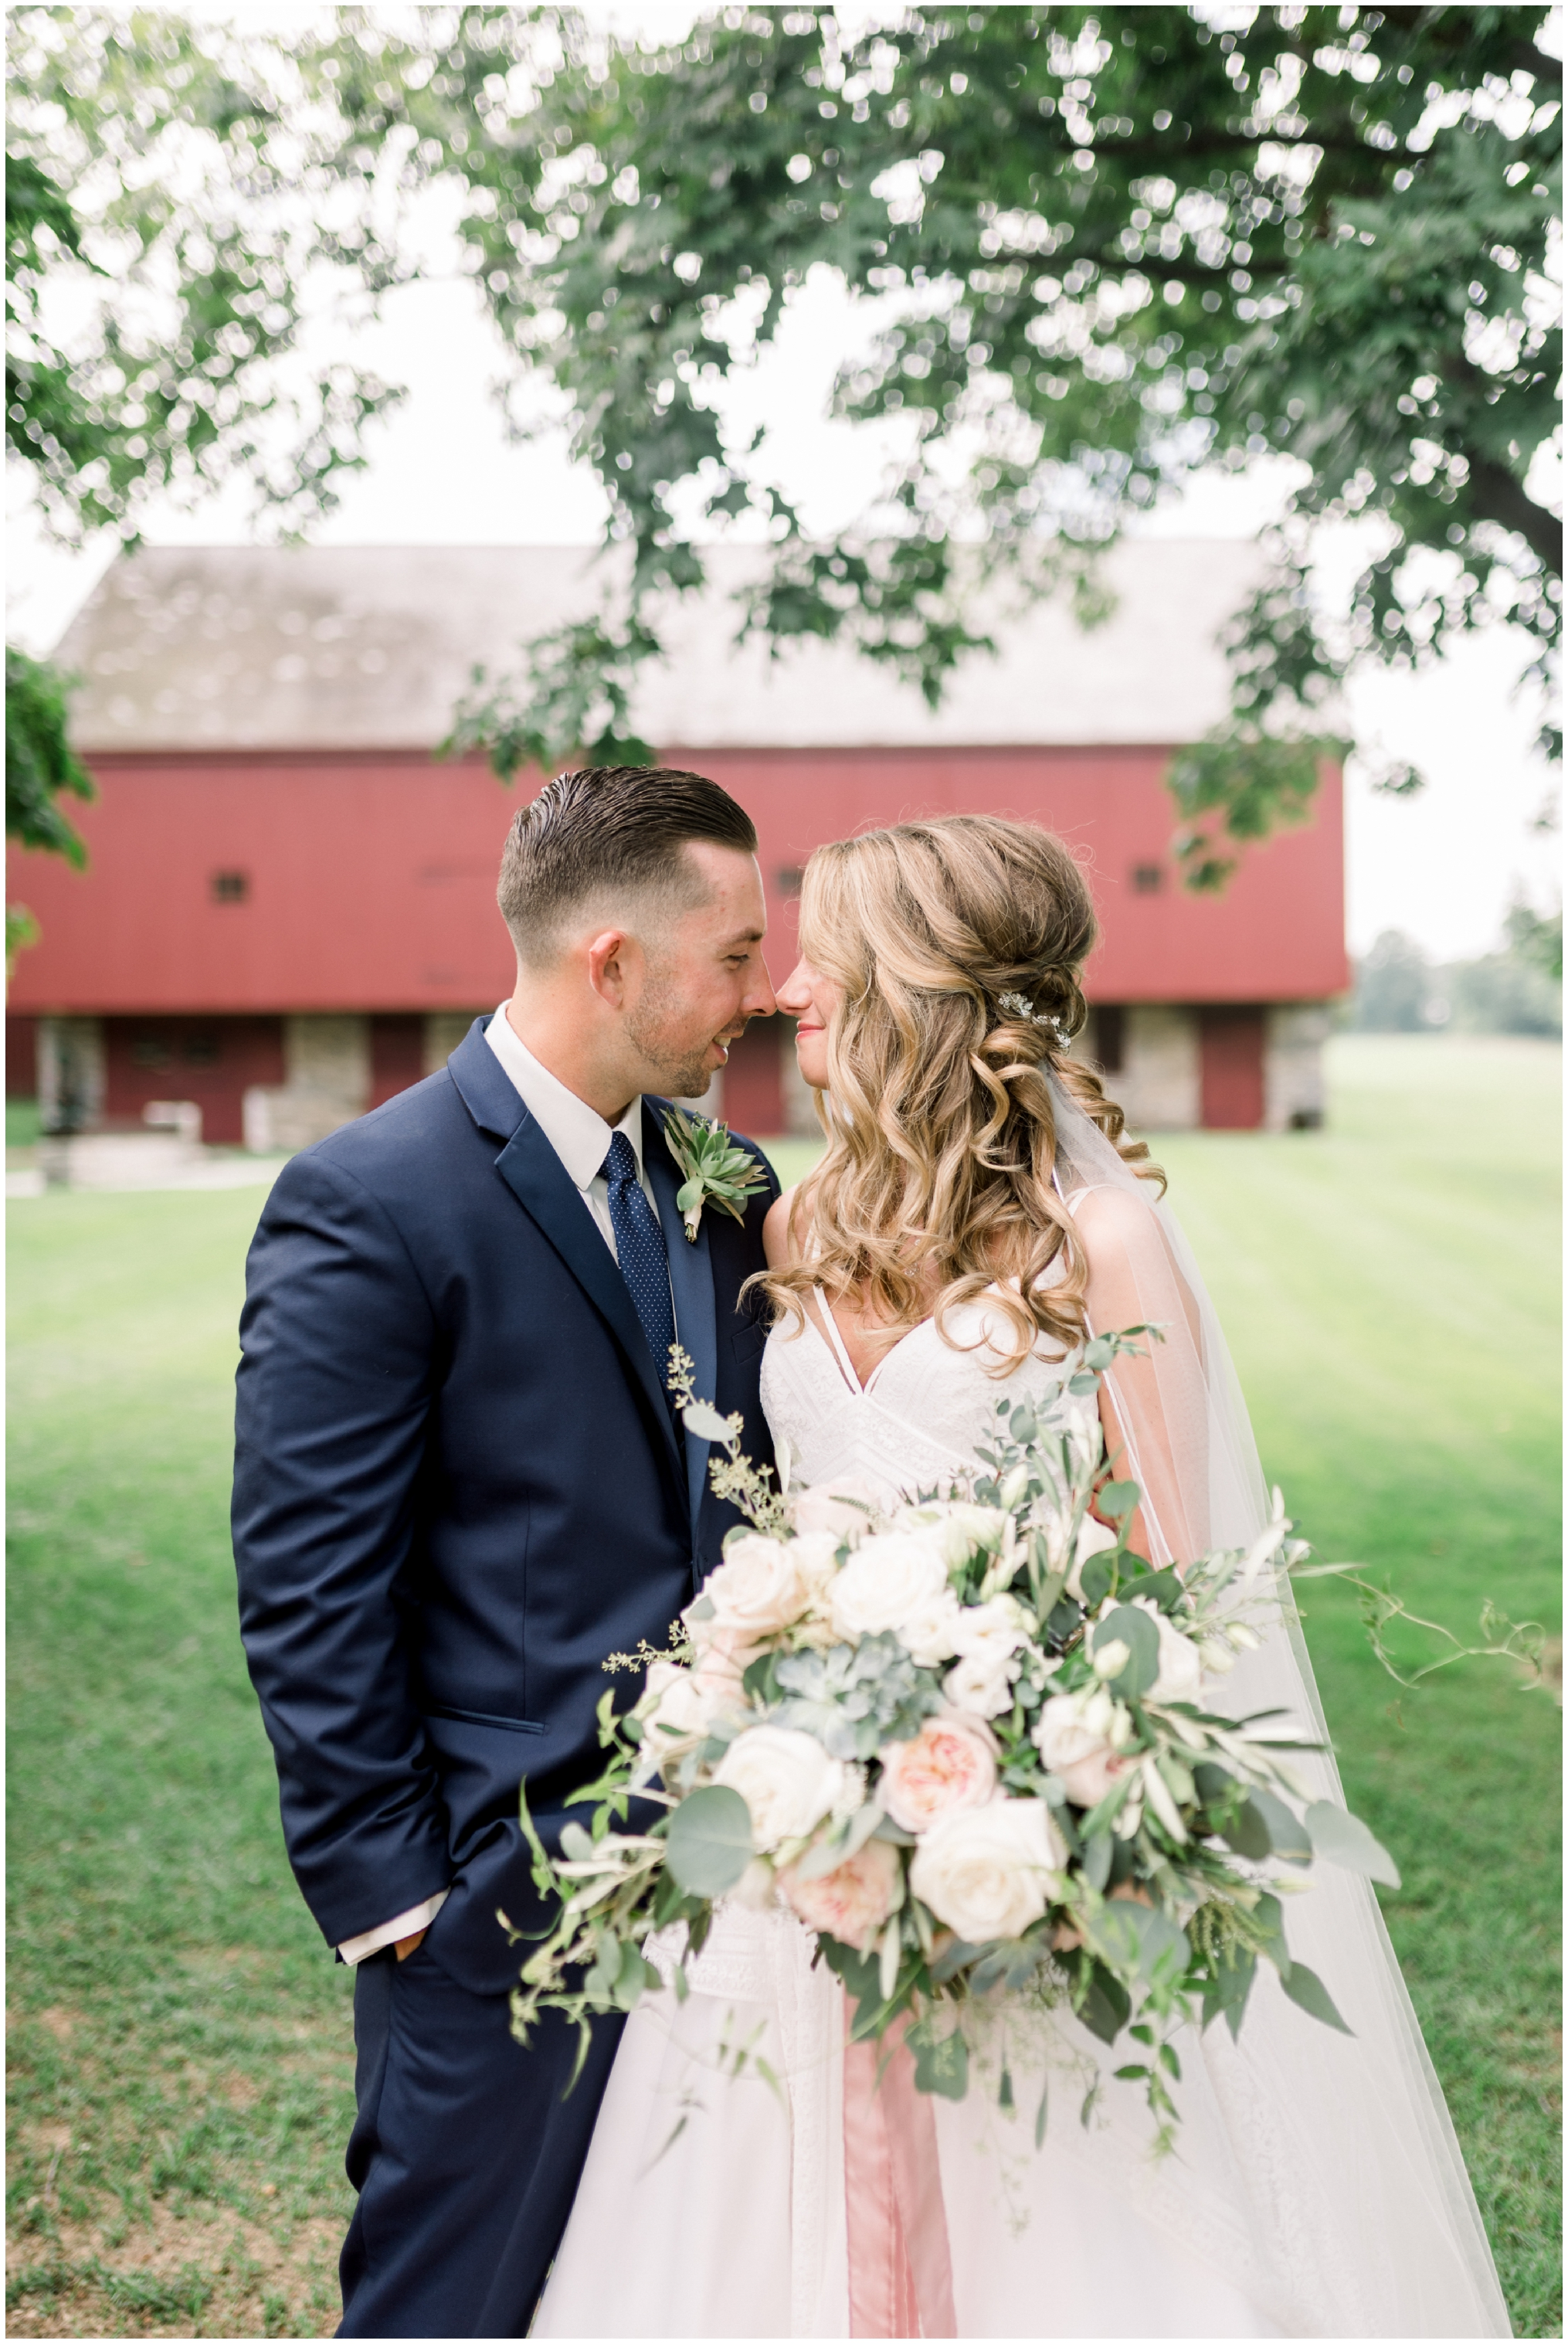 Krista Brackin Photography | July Wedding at The Farm at Eagle's Ridge_0012.jpg